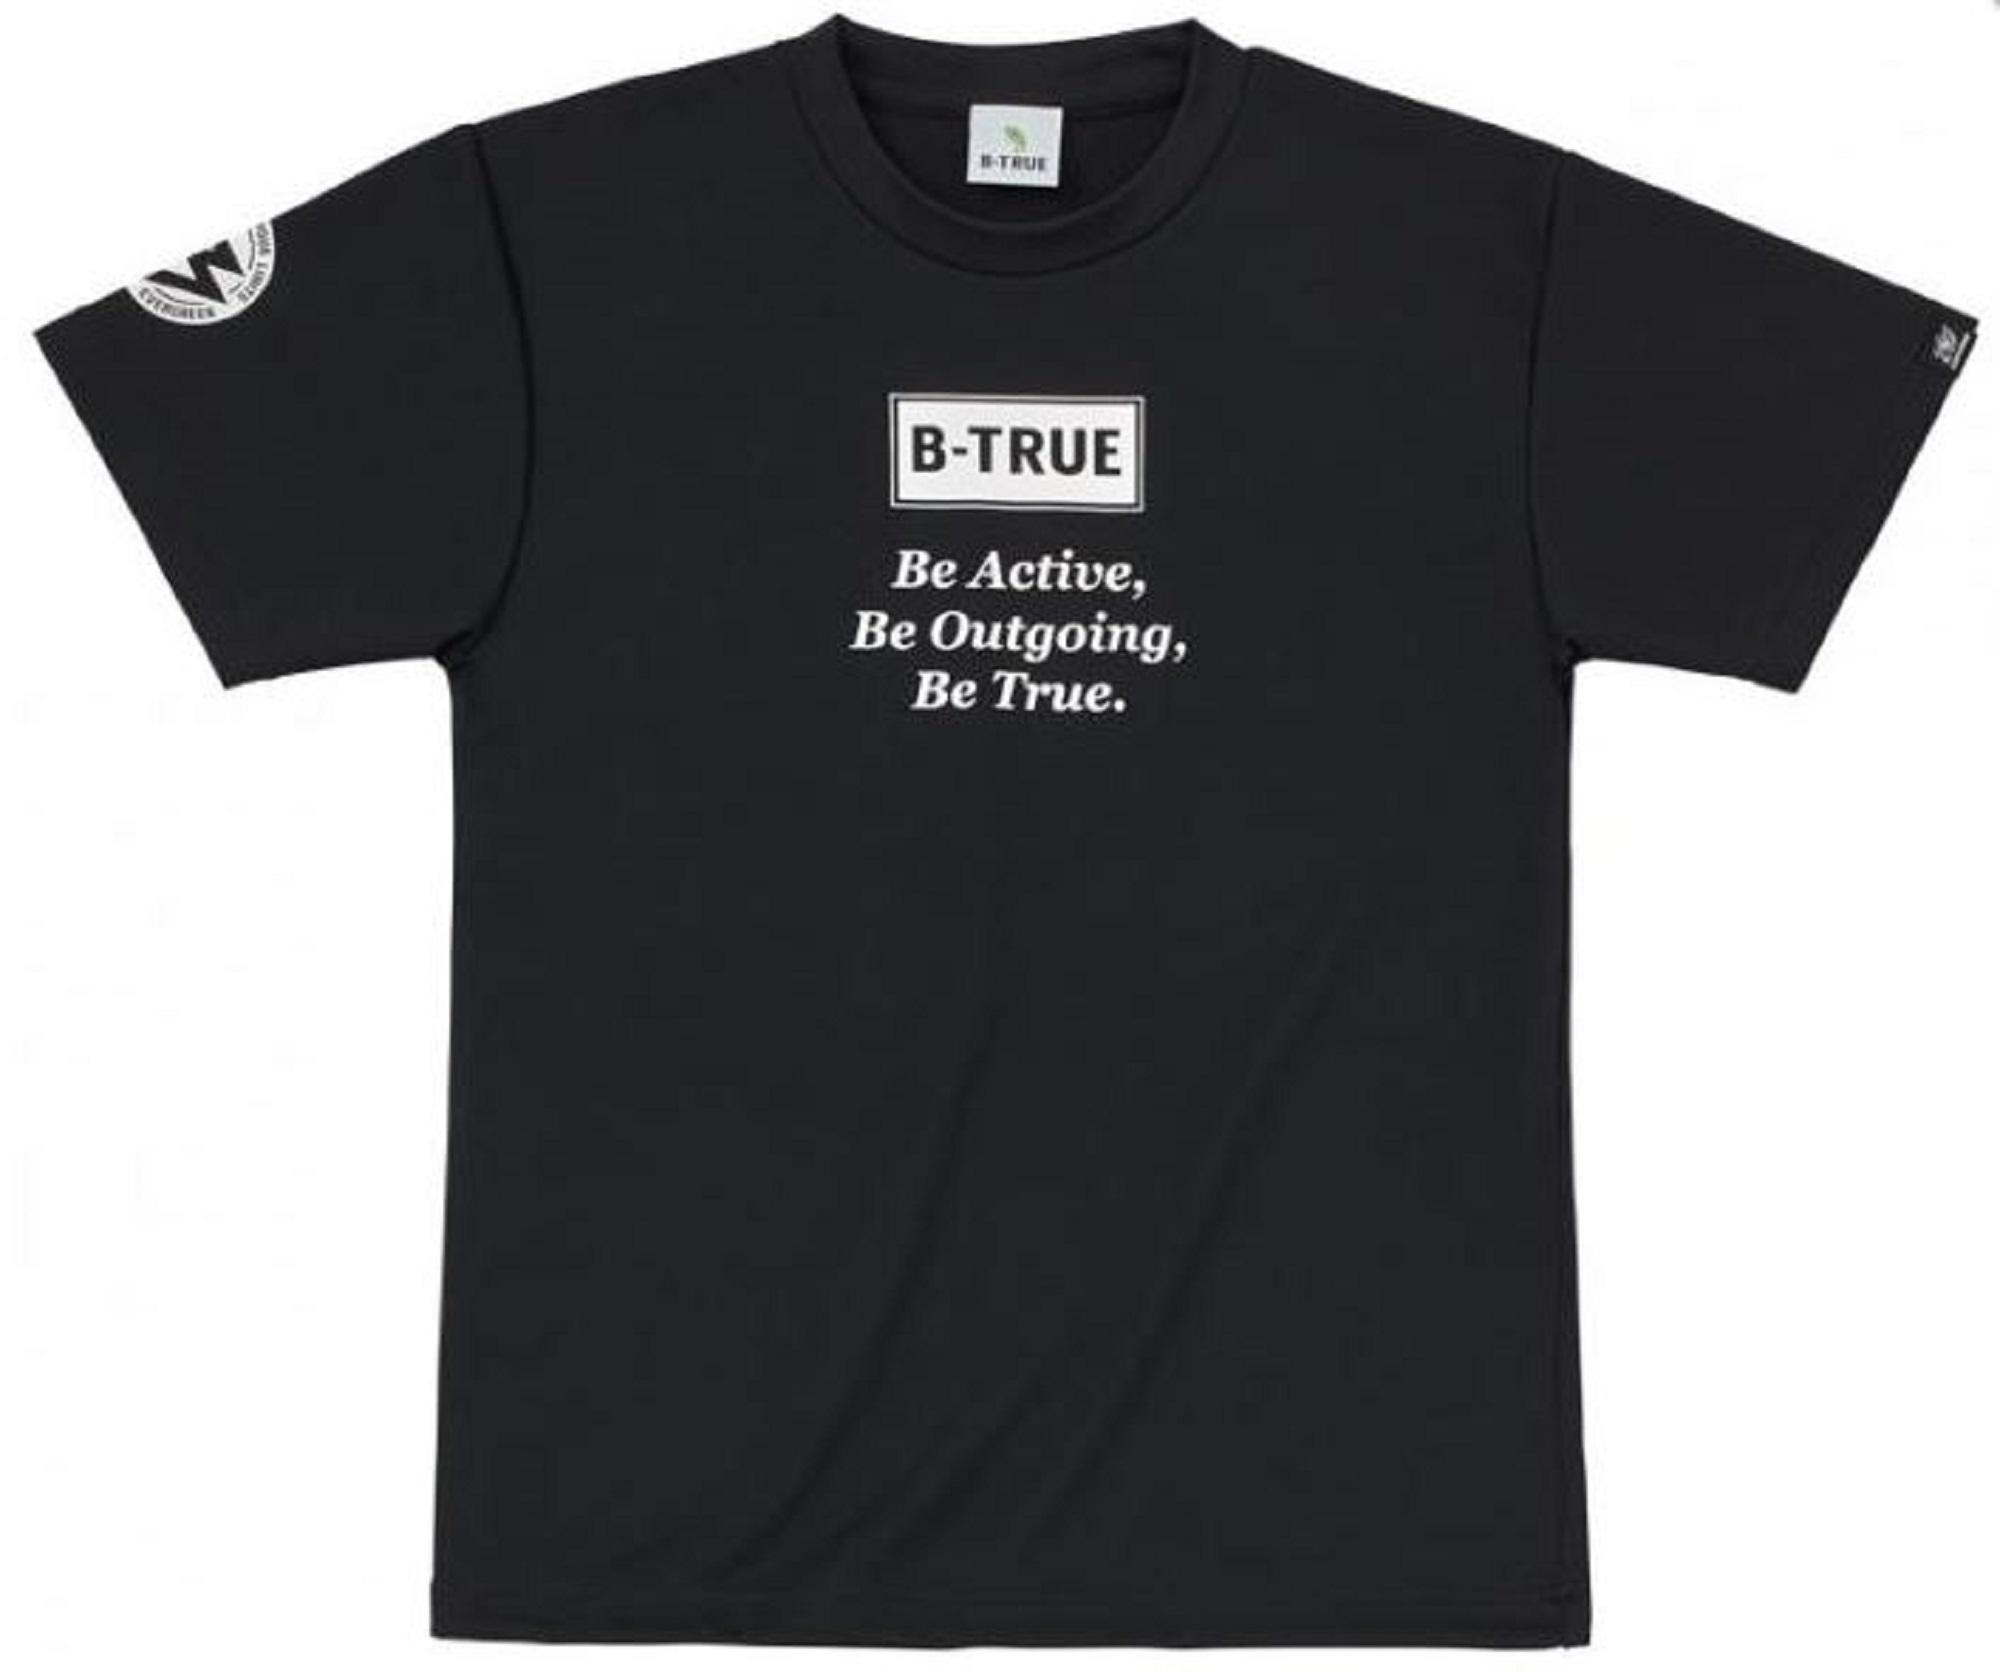 Evergreen T-Shirt Dry Fit Short Sleeve B-True D Type Size L Black (4852)